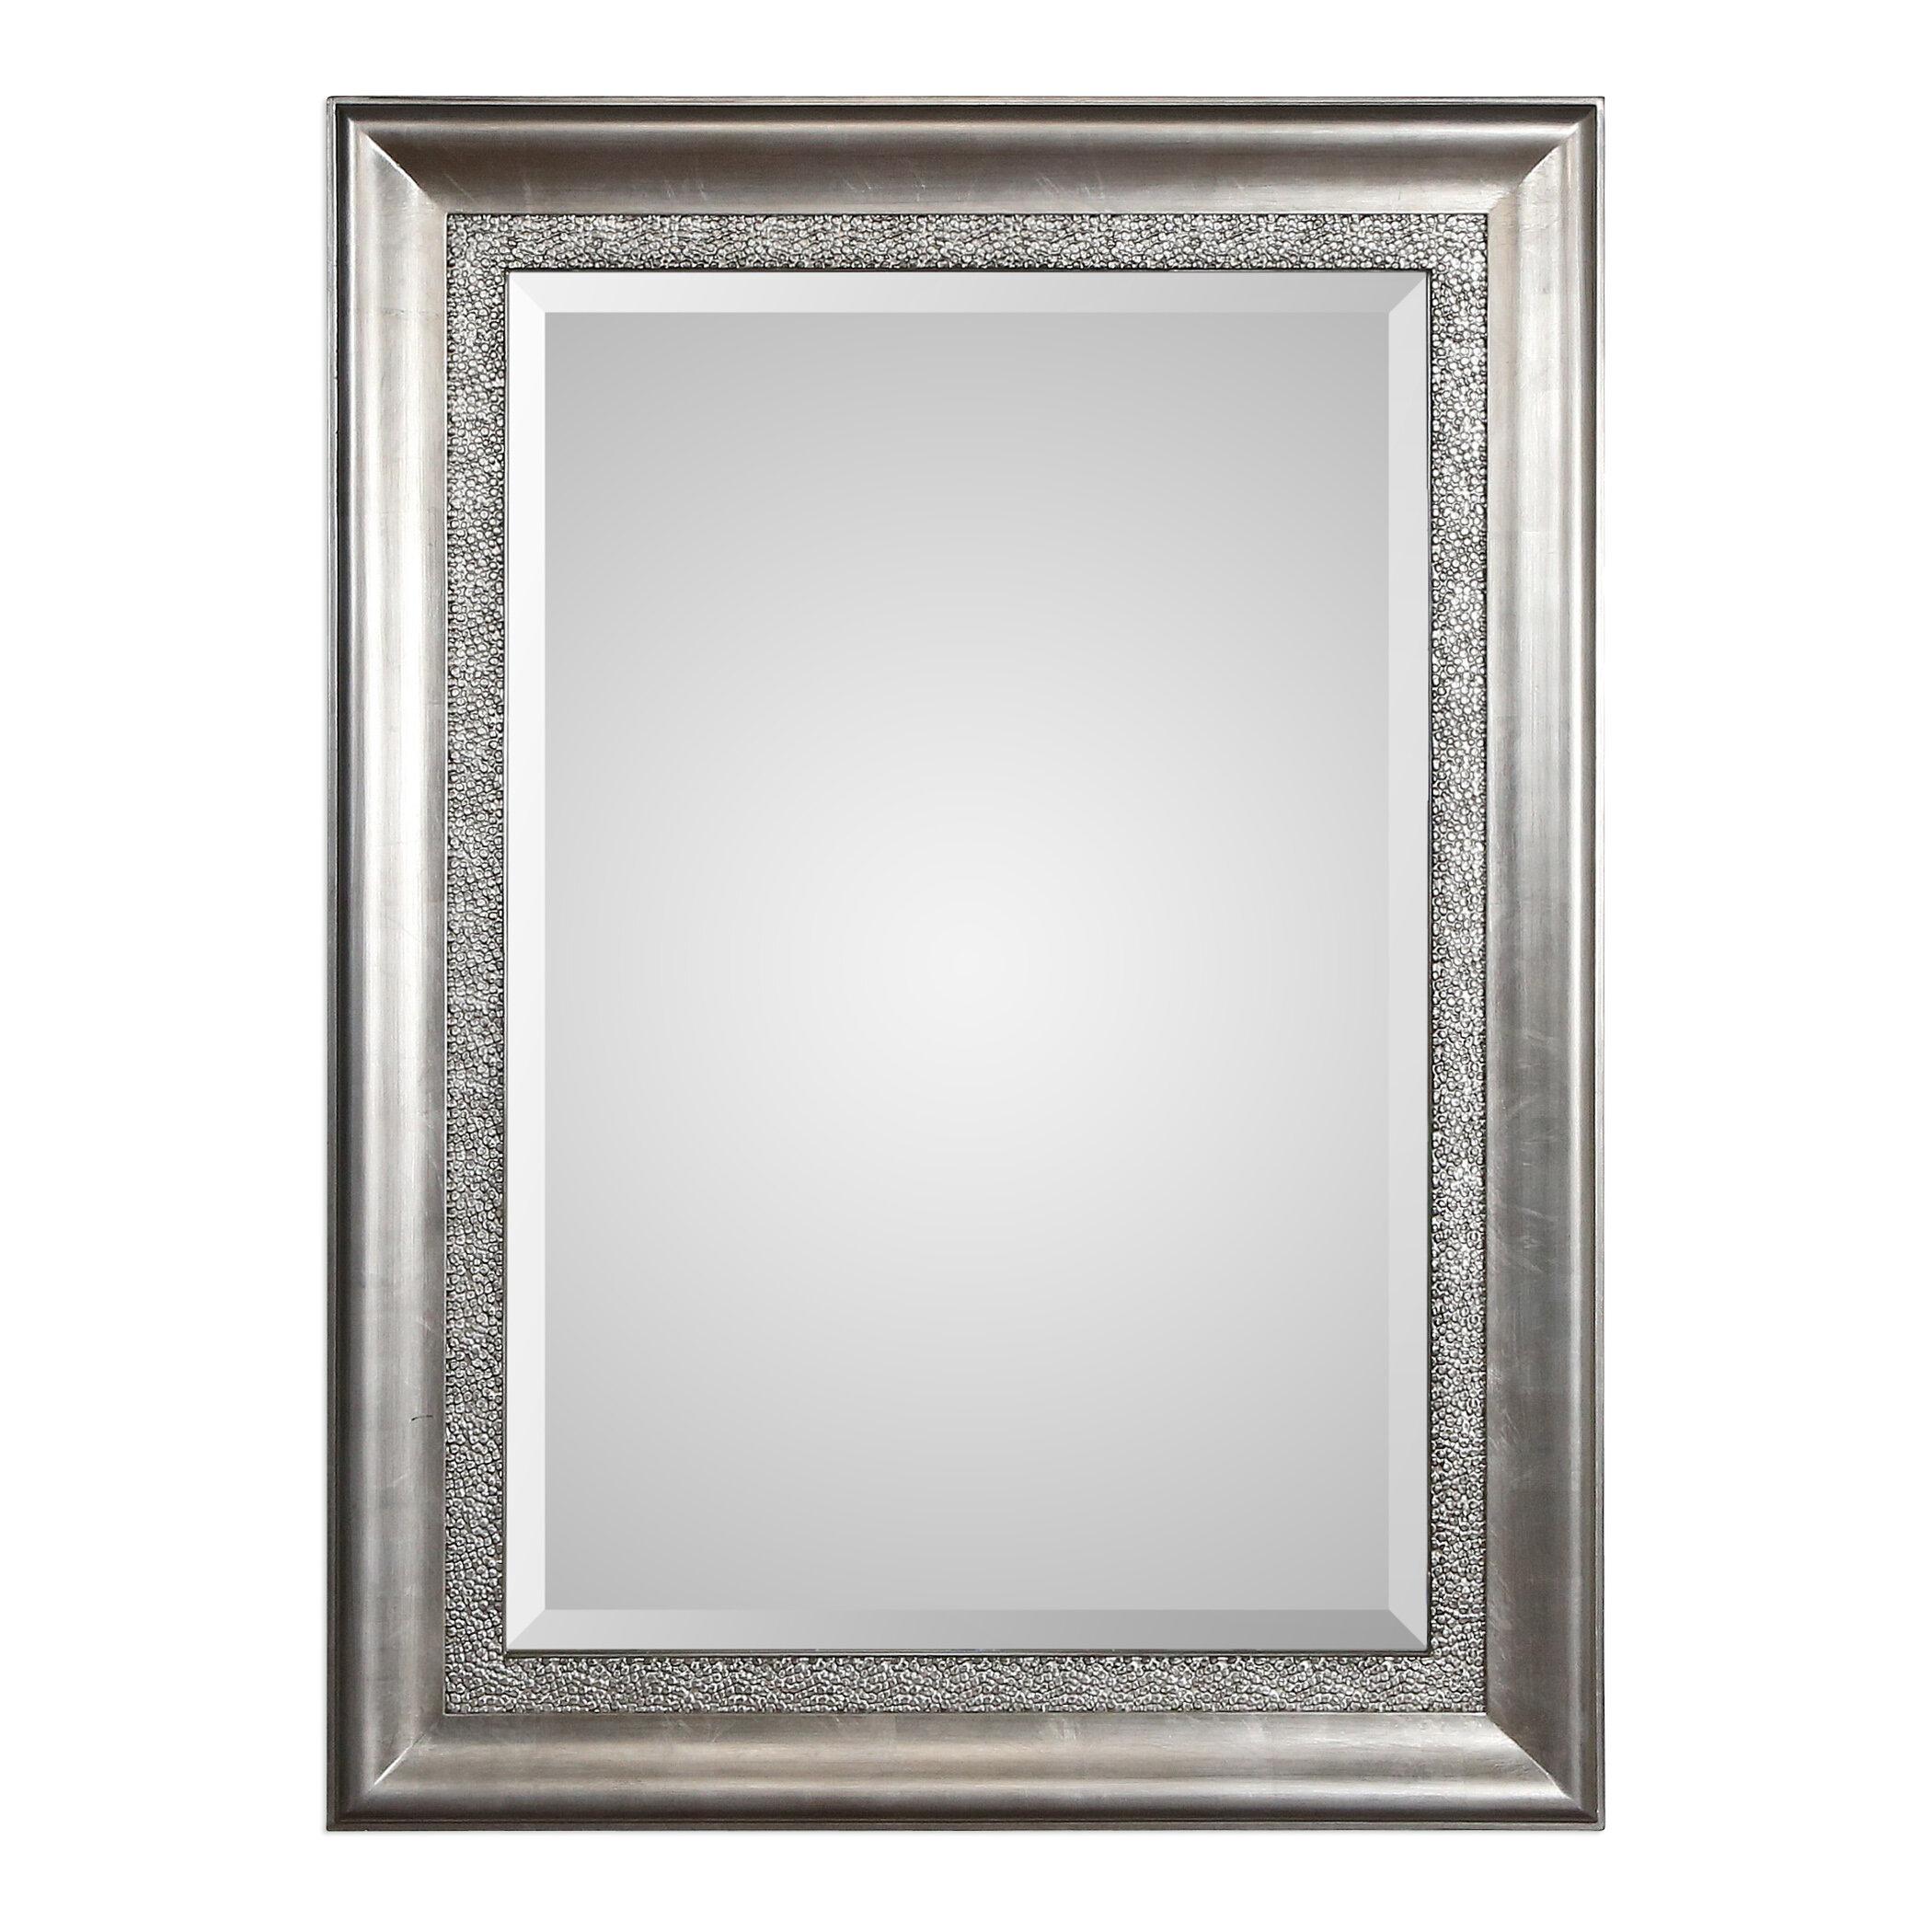 Willa Arlo Interiors Ellie Bevelled Silver Wall Mirror & Reviews ...